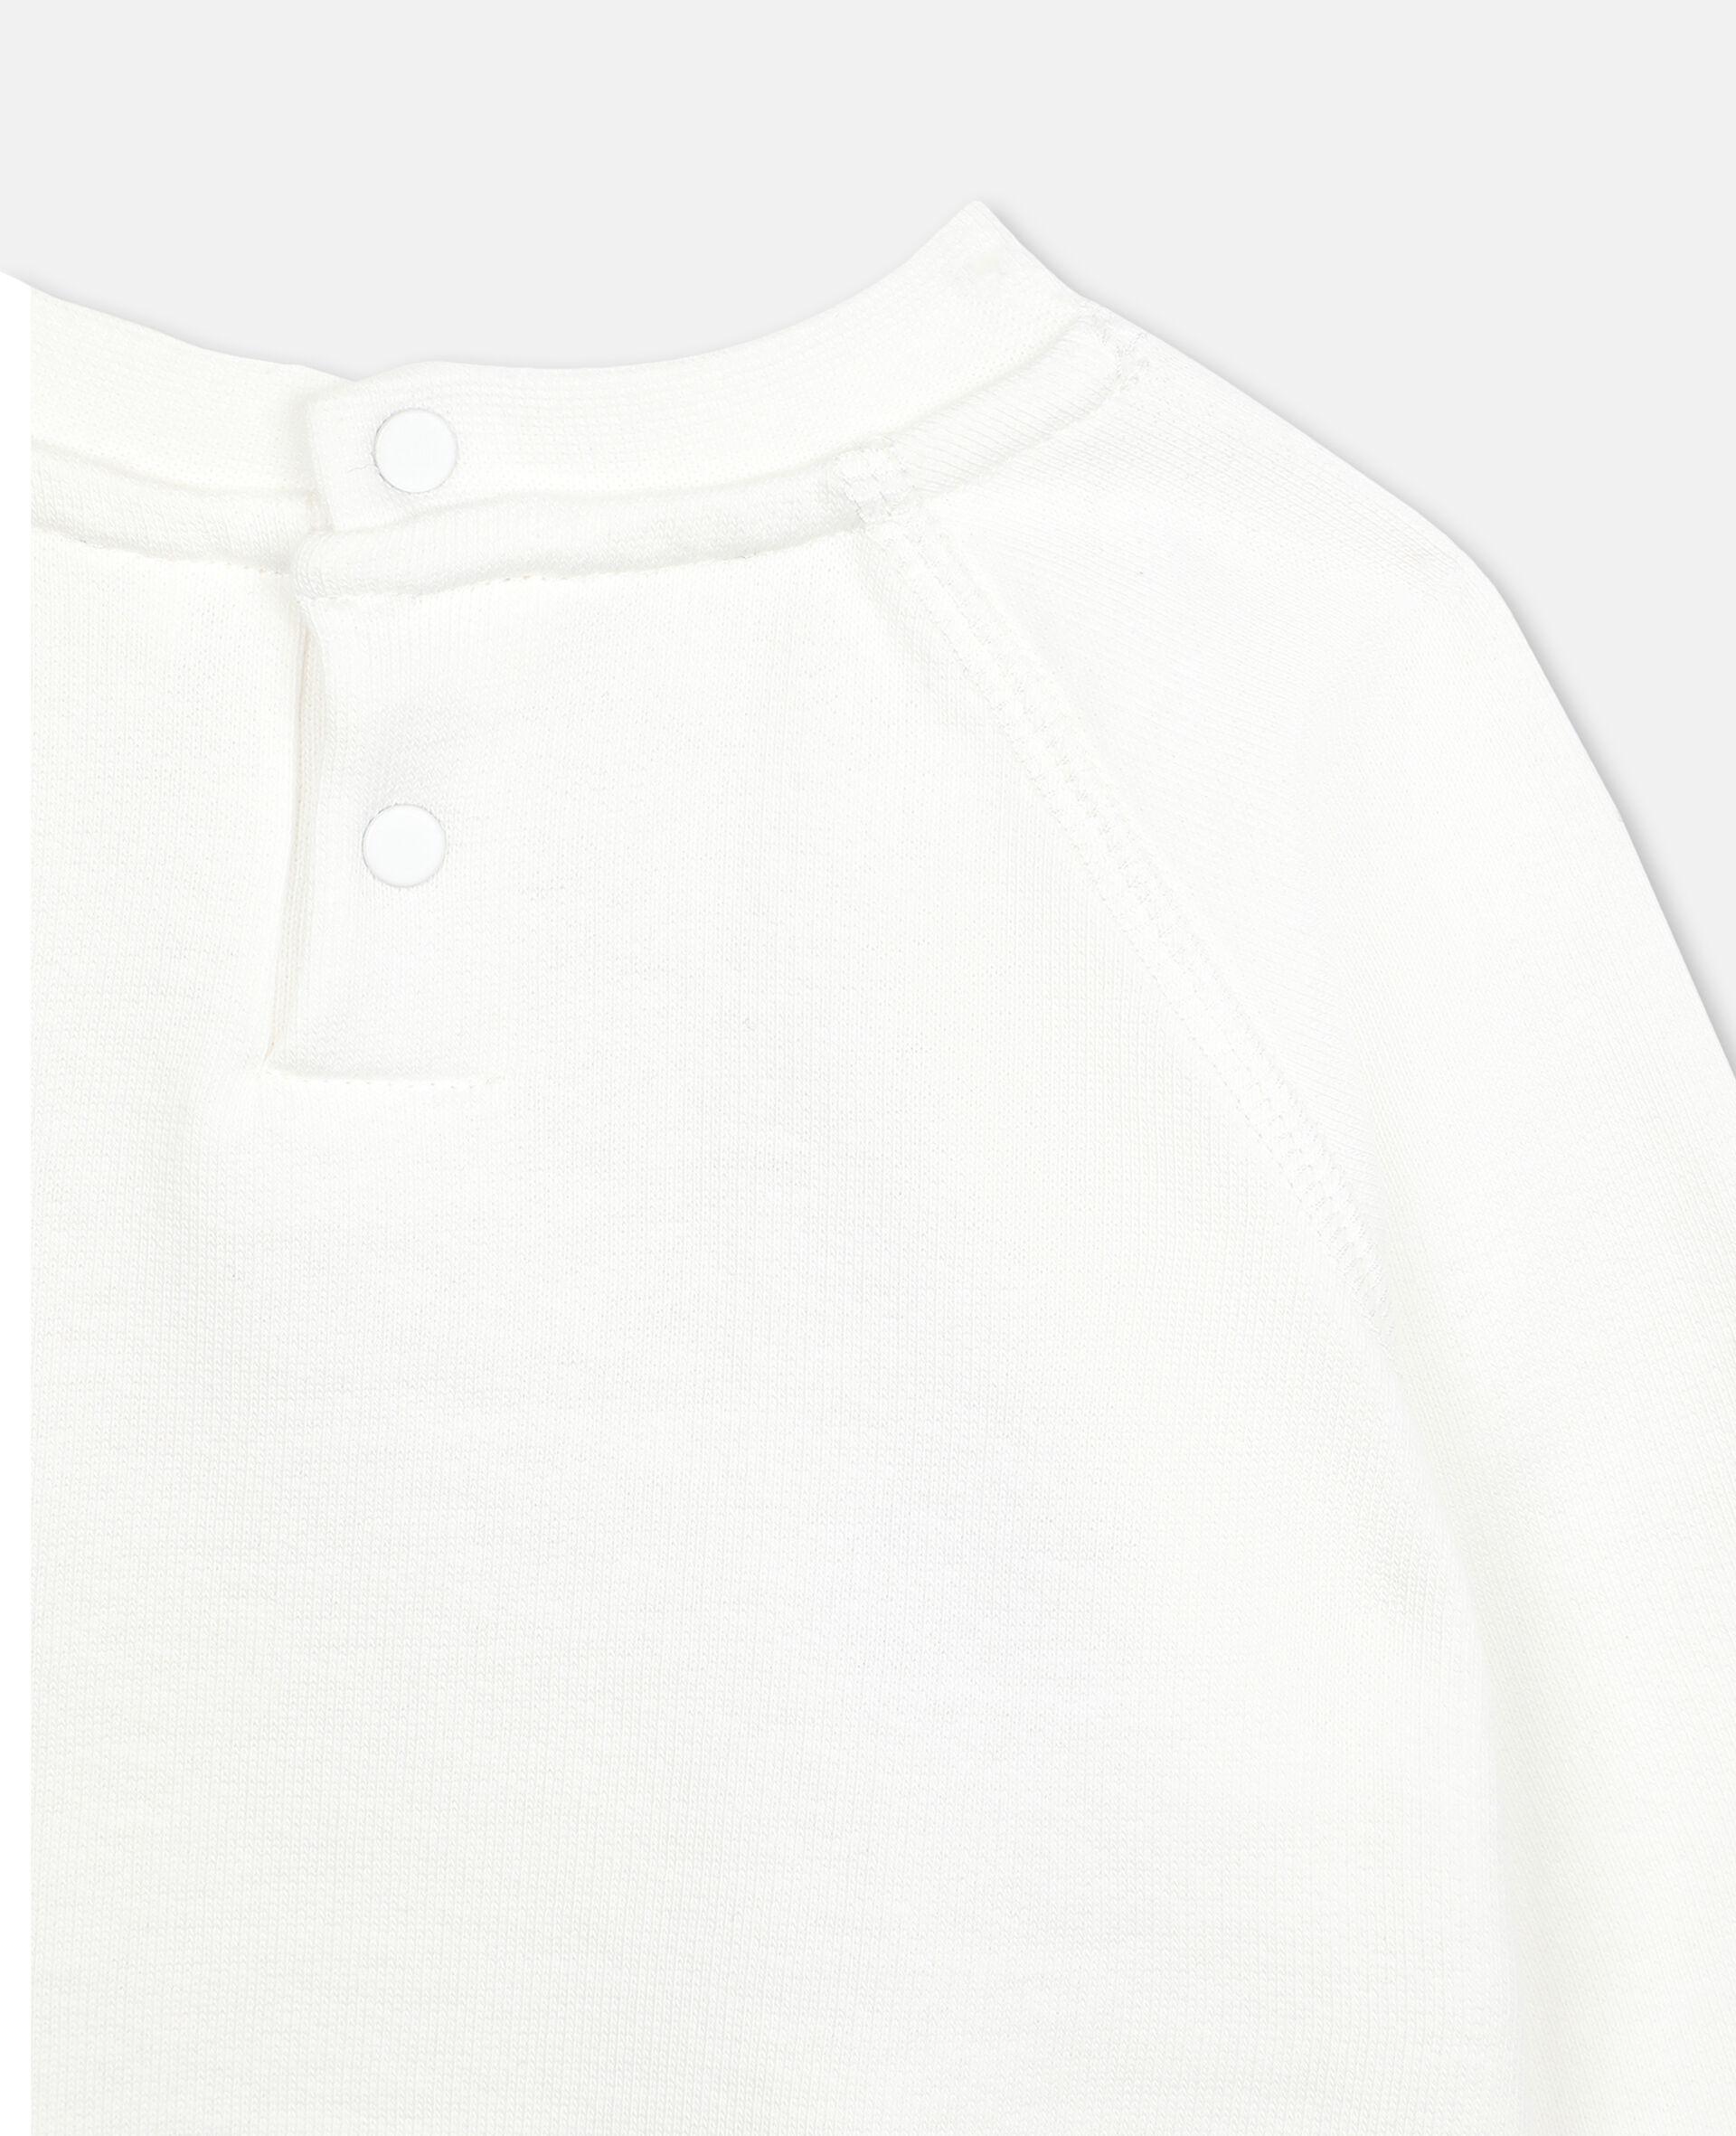 Butterfly Fleece Sweatshirt-White-large image number 2